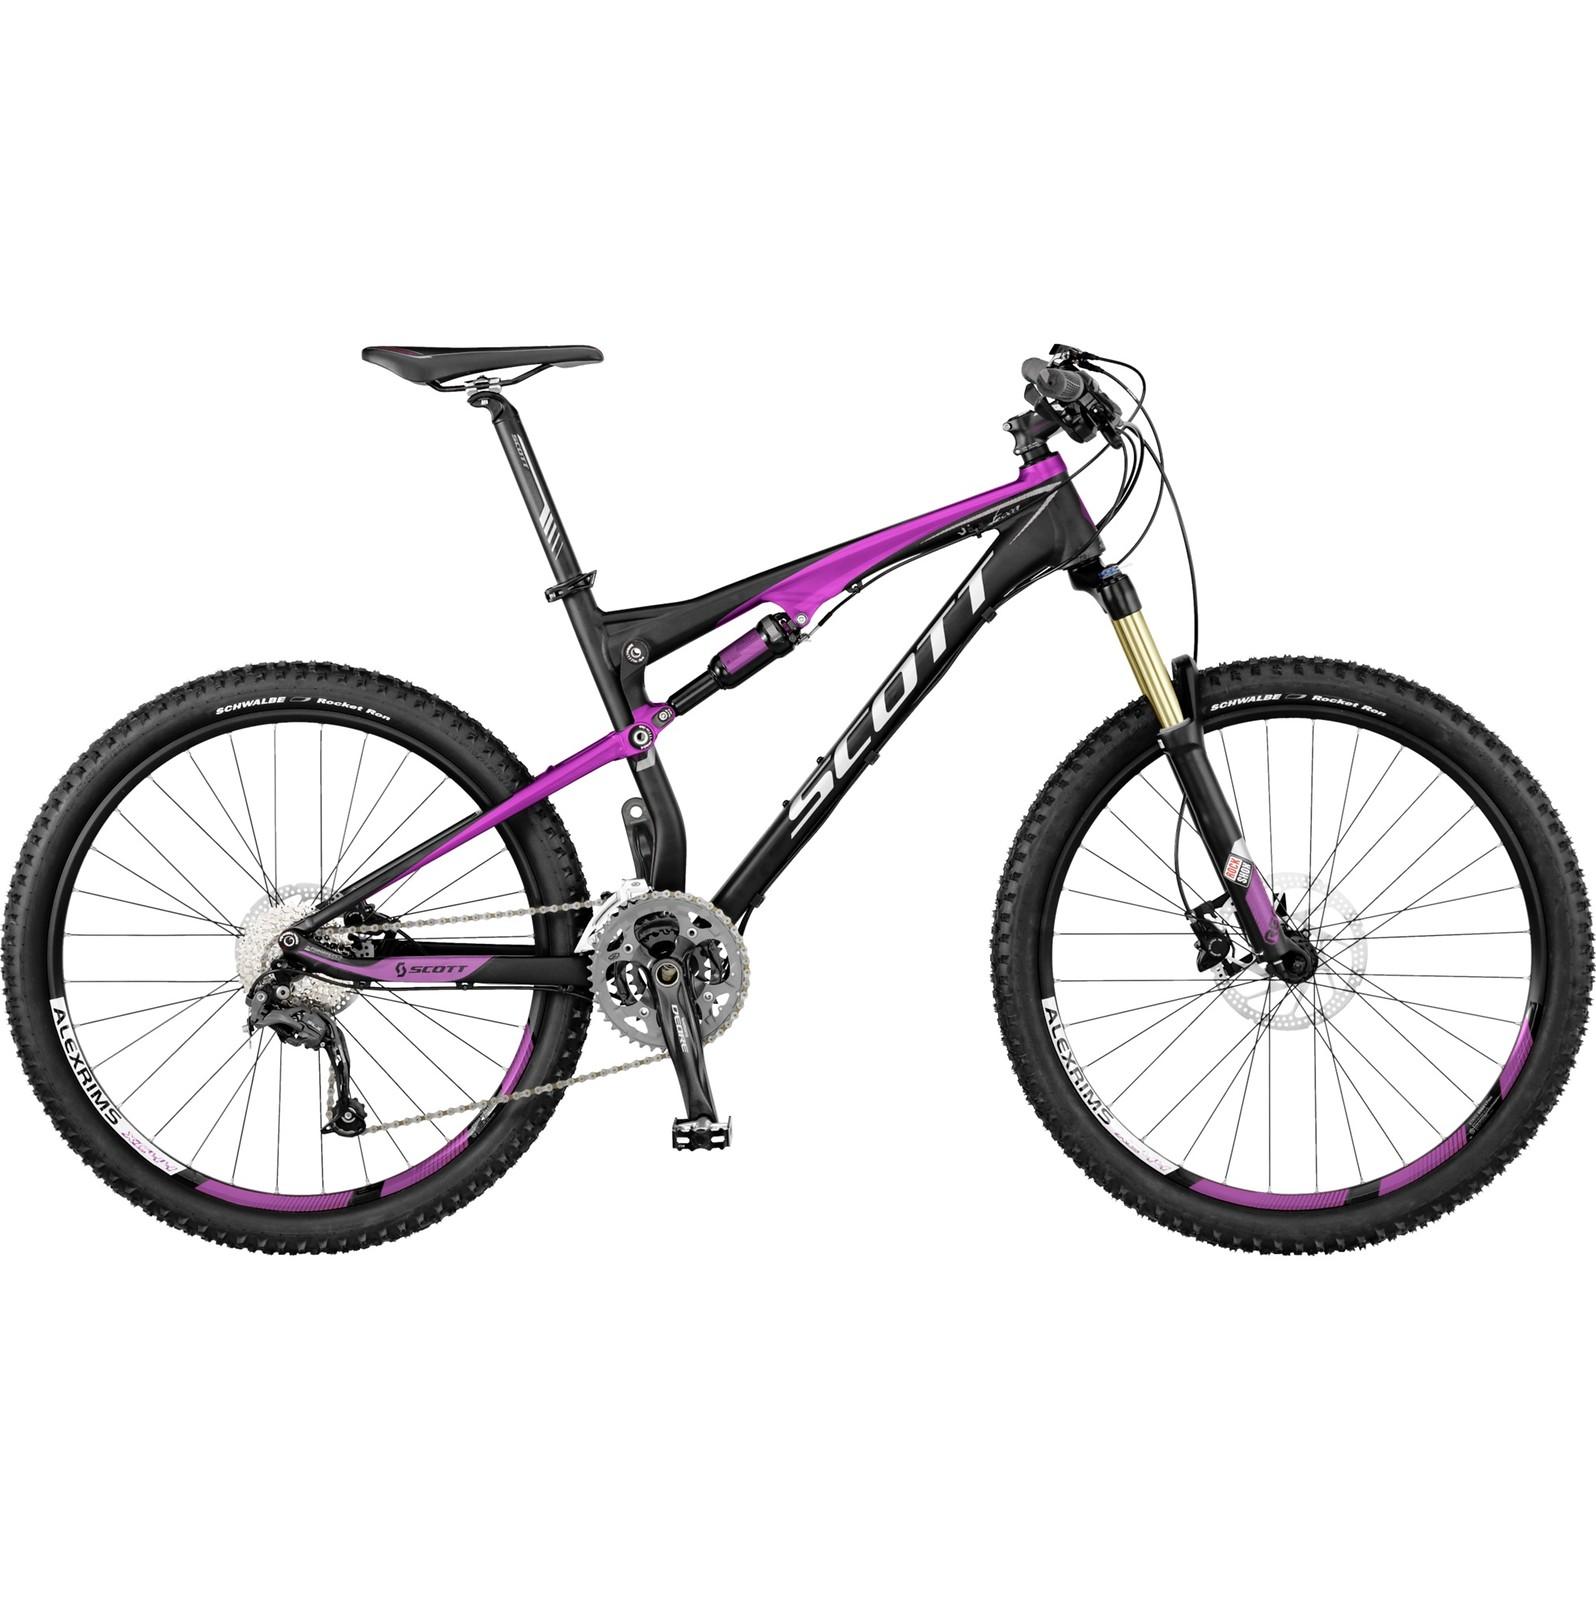 2012 Scott Contessa Spark Bike 221780